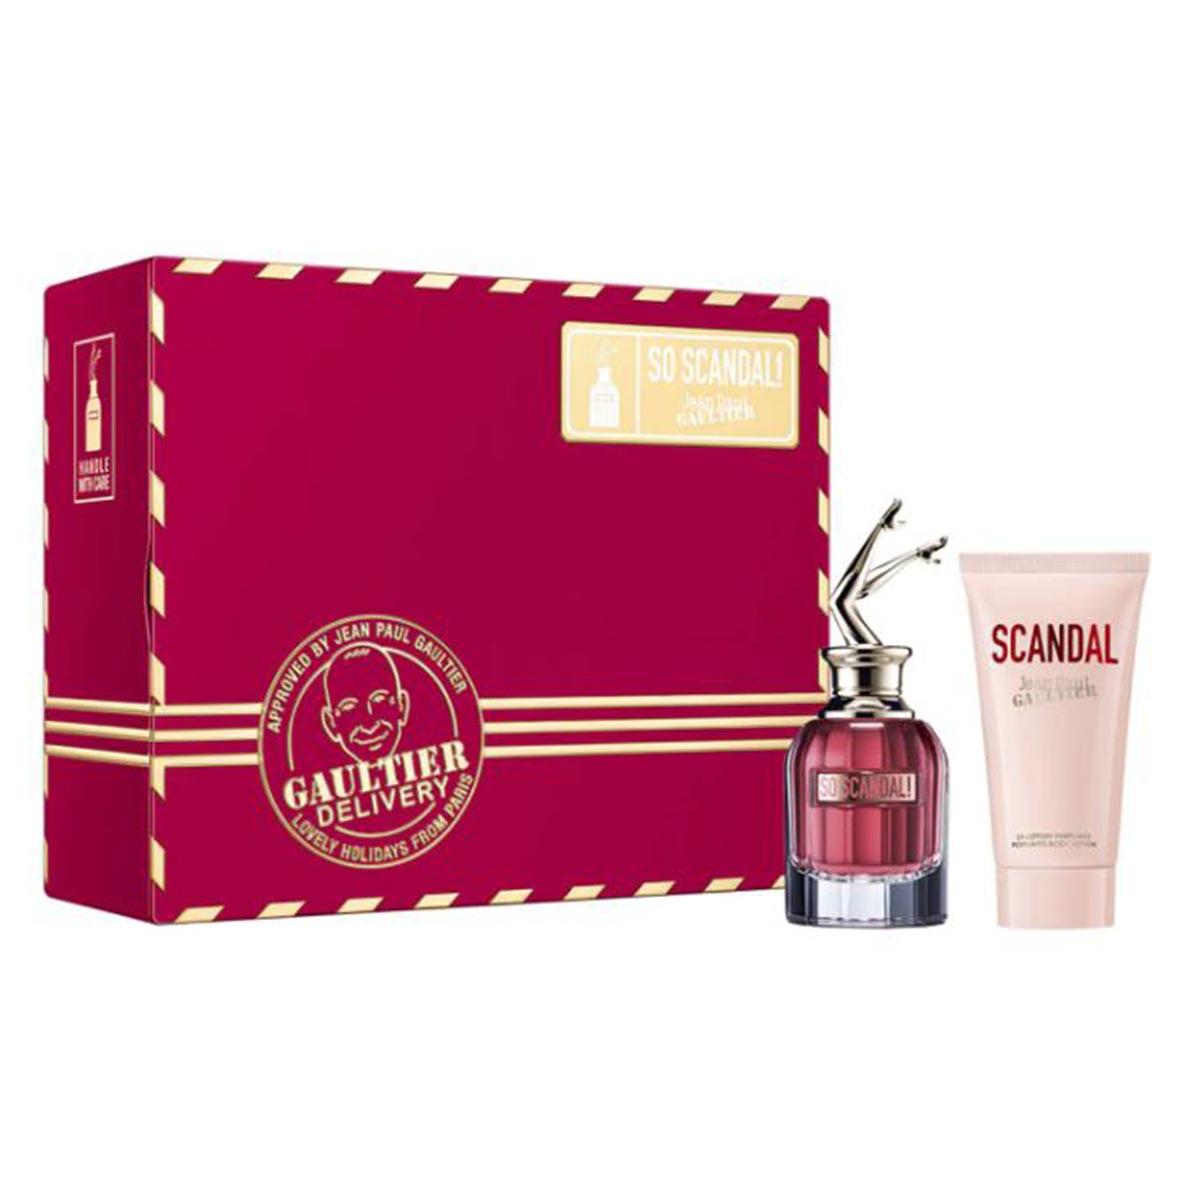 Jean paul gaultier so scandal eau de parfum 50ml locion corporal perfumada 75ml